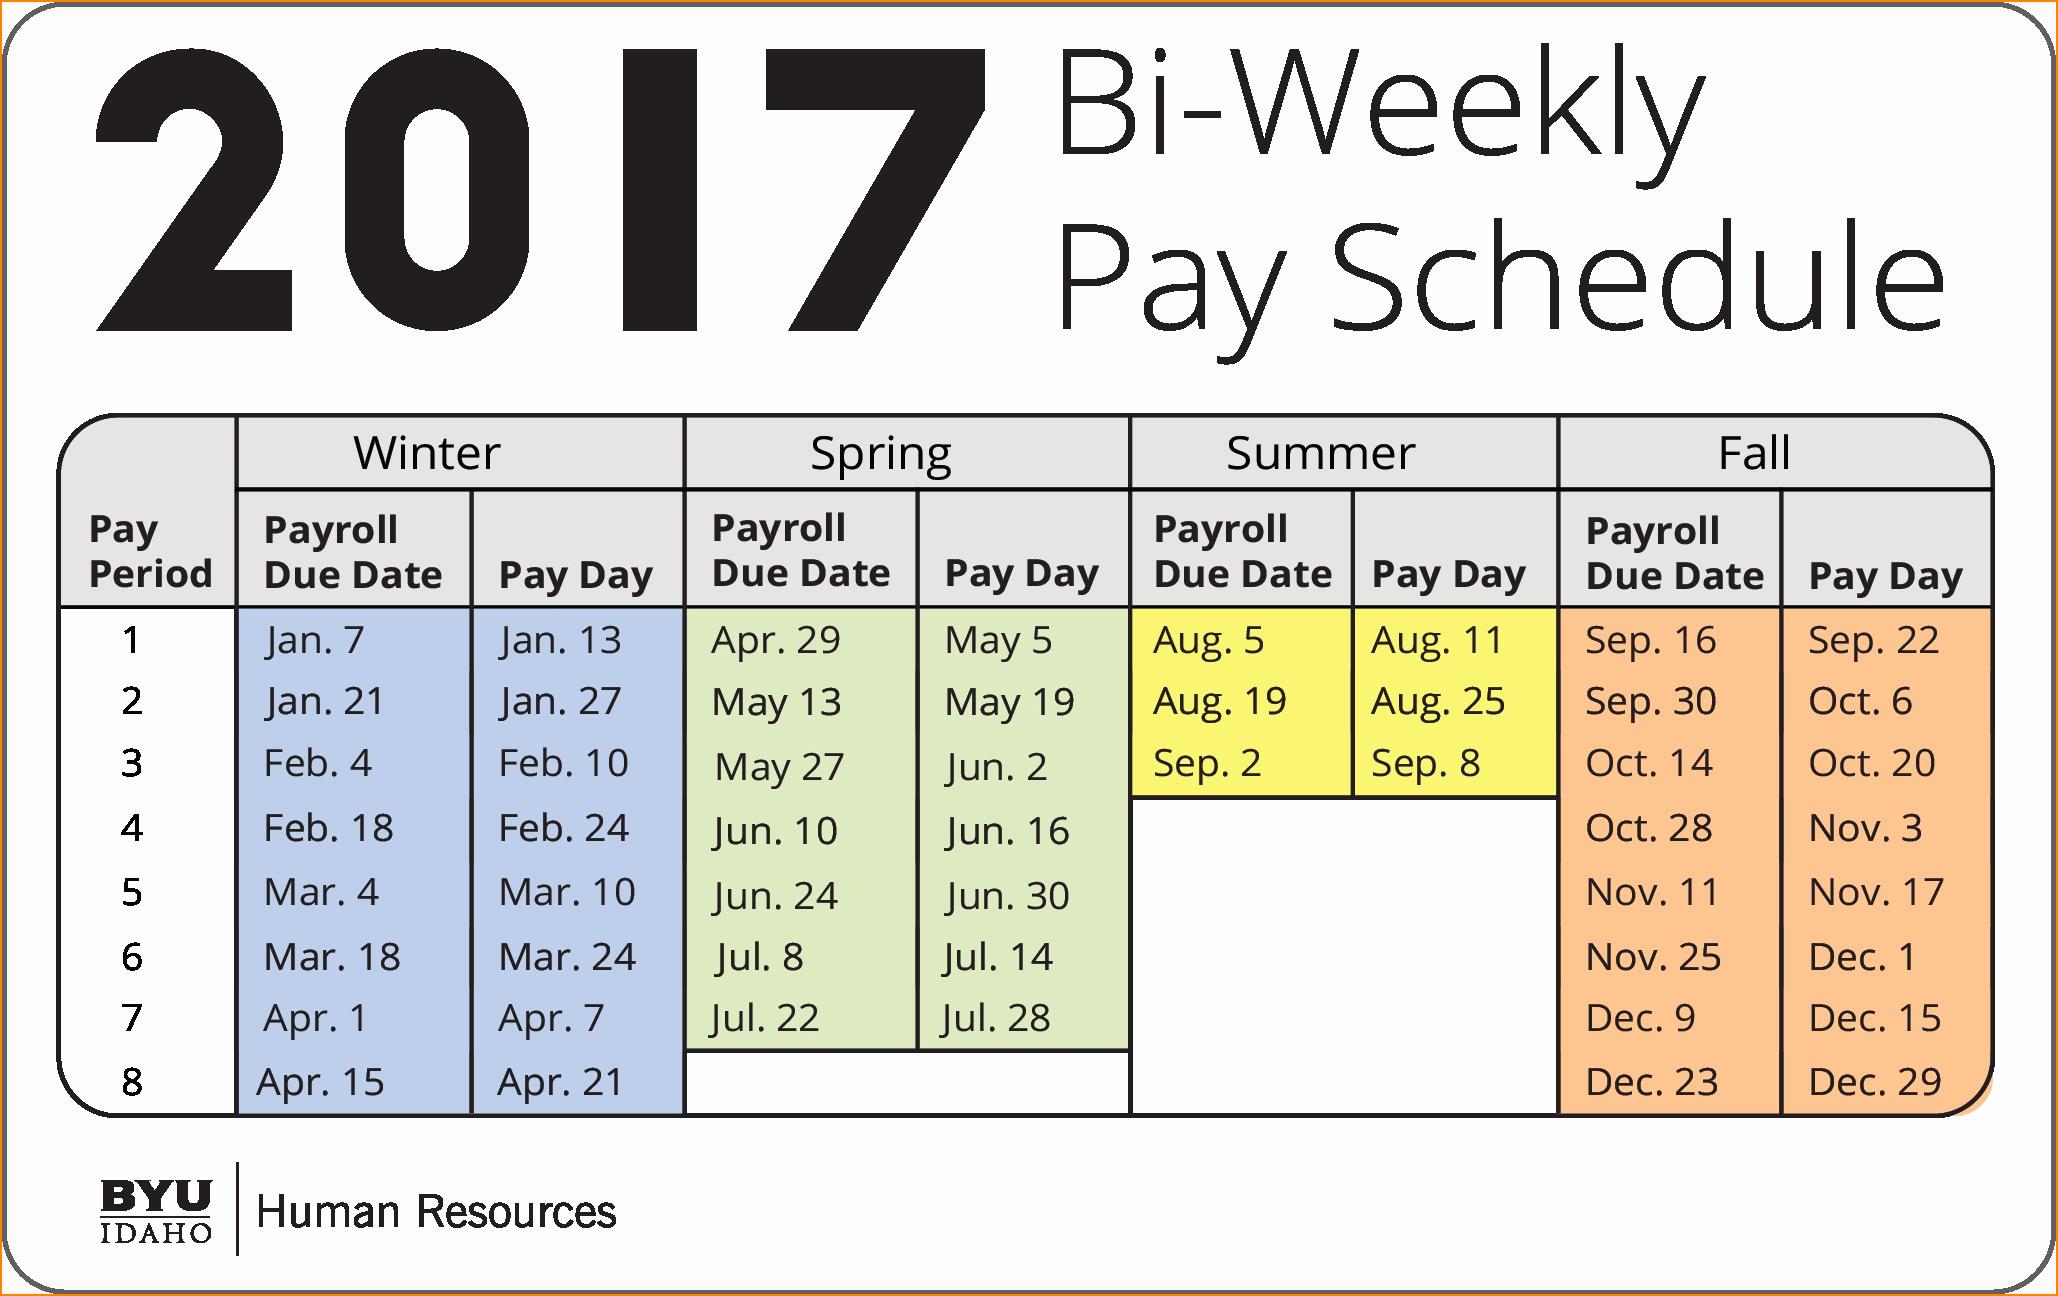 2017 Biweekly Payroll Calendar Template Lovely 10 Biweekly Payroll Calendar Template 2017